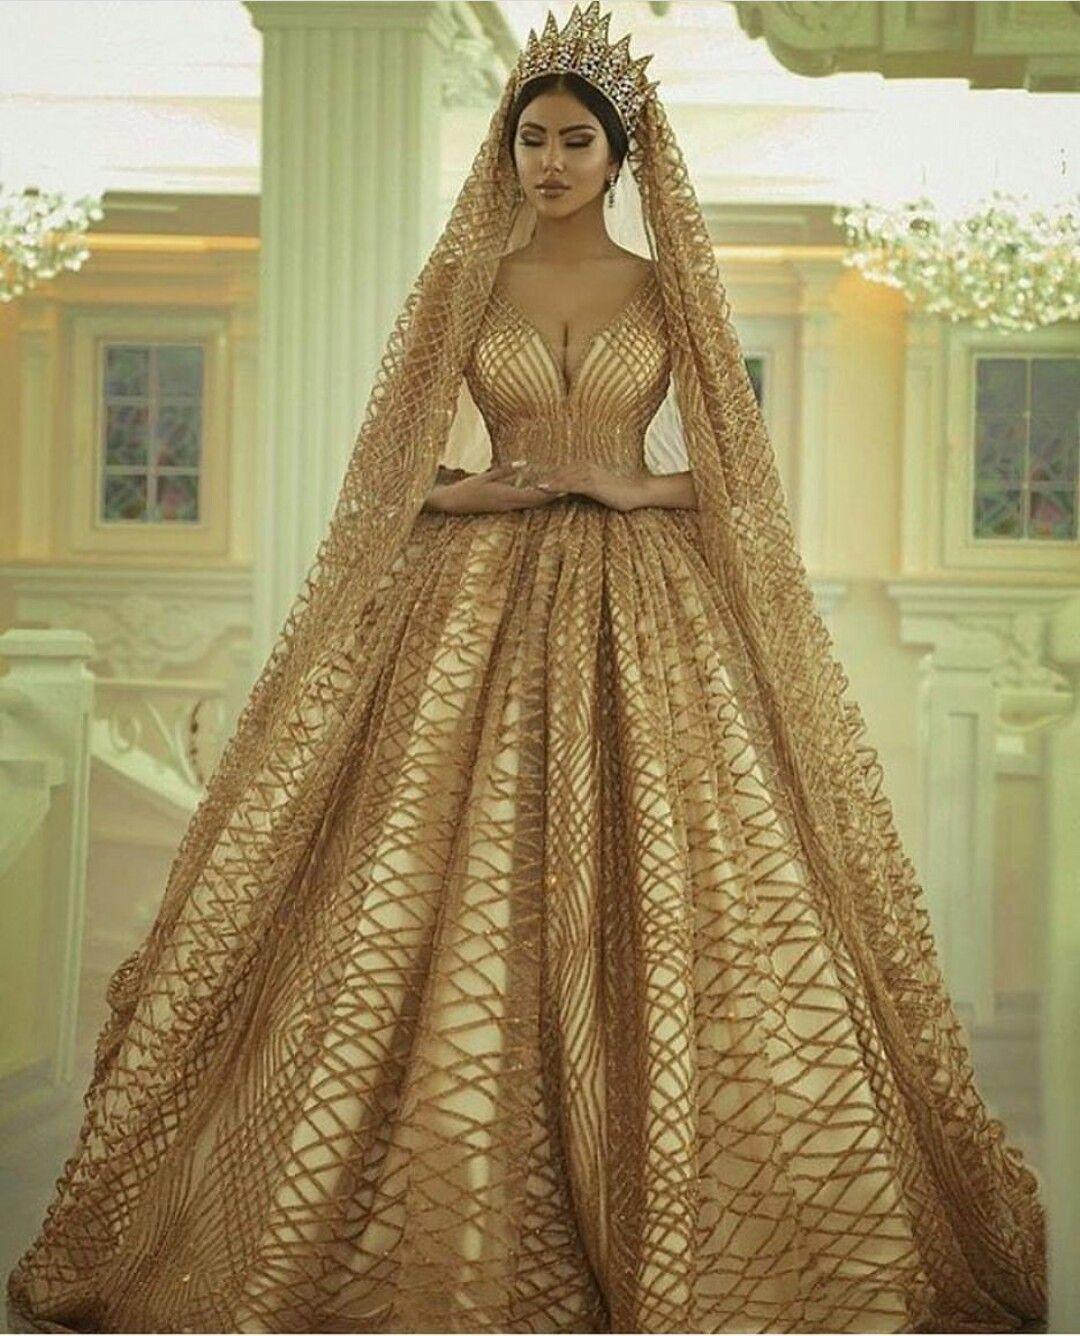 Pin By Mina Tajik On Dresses Nice Dresses Gowns Ball Gowns [ 1336 x 1080 Pixel ]